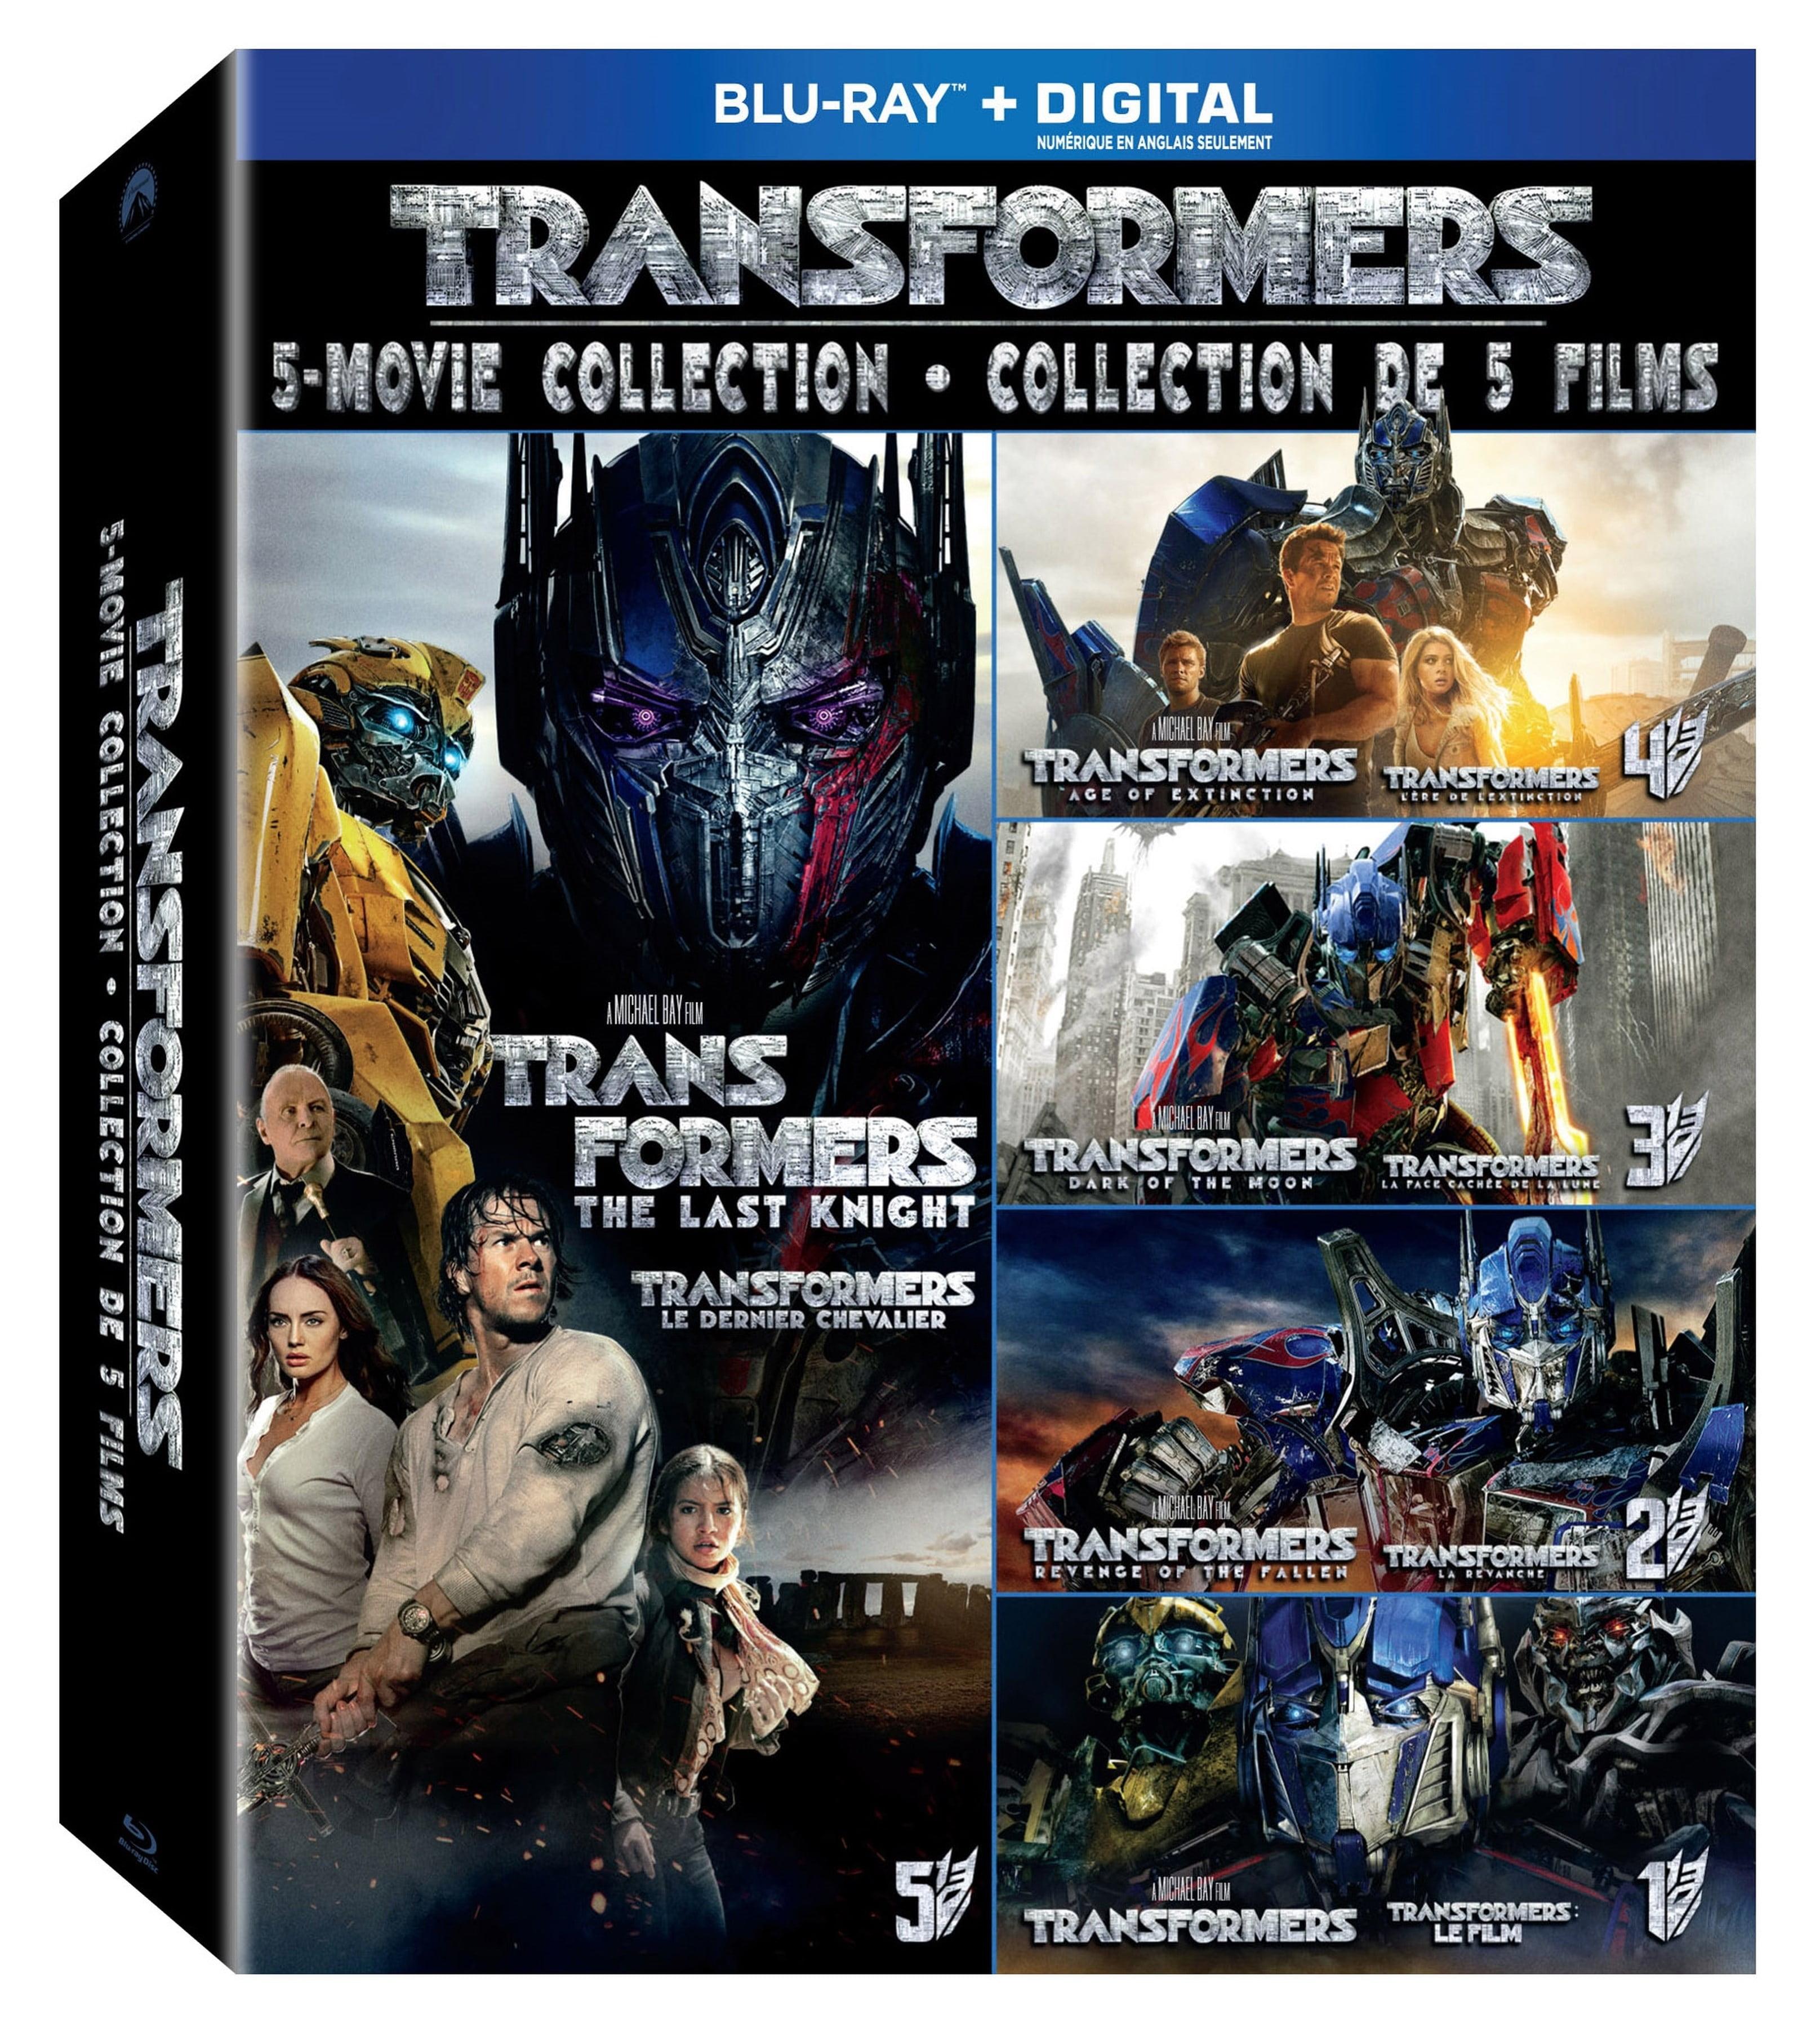 Transformers 5-disc Blu-ray pack